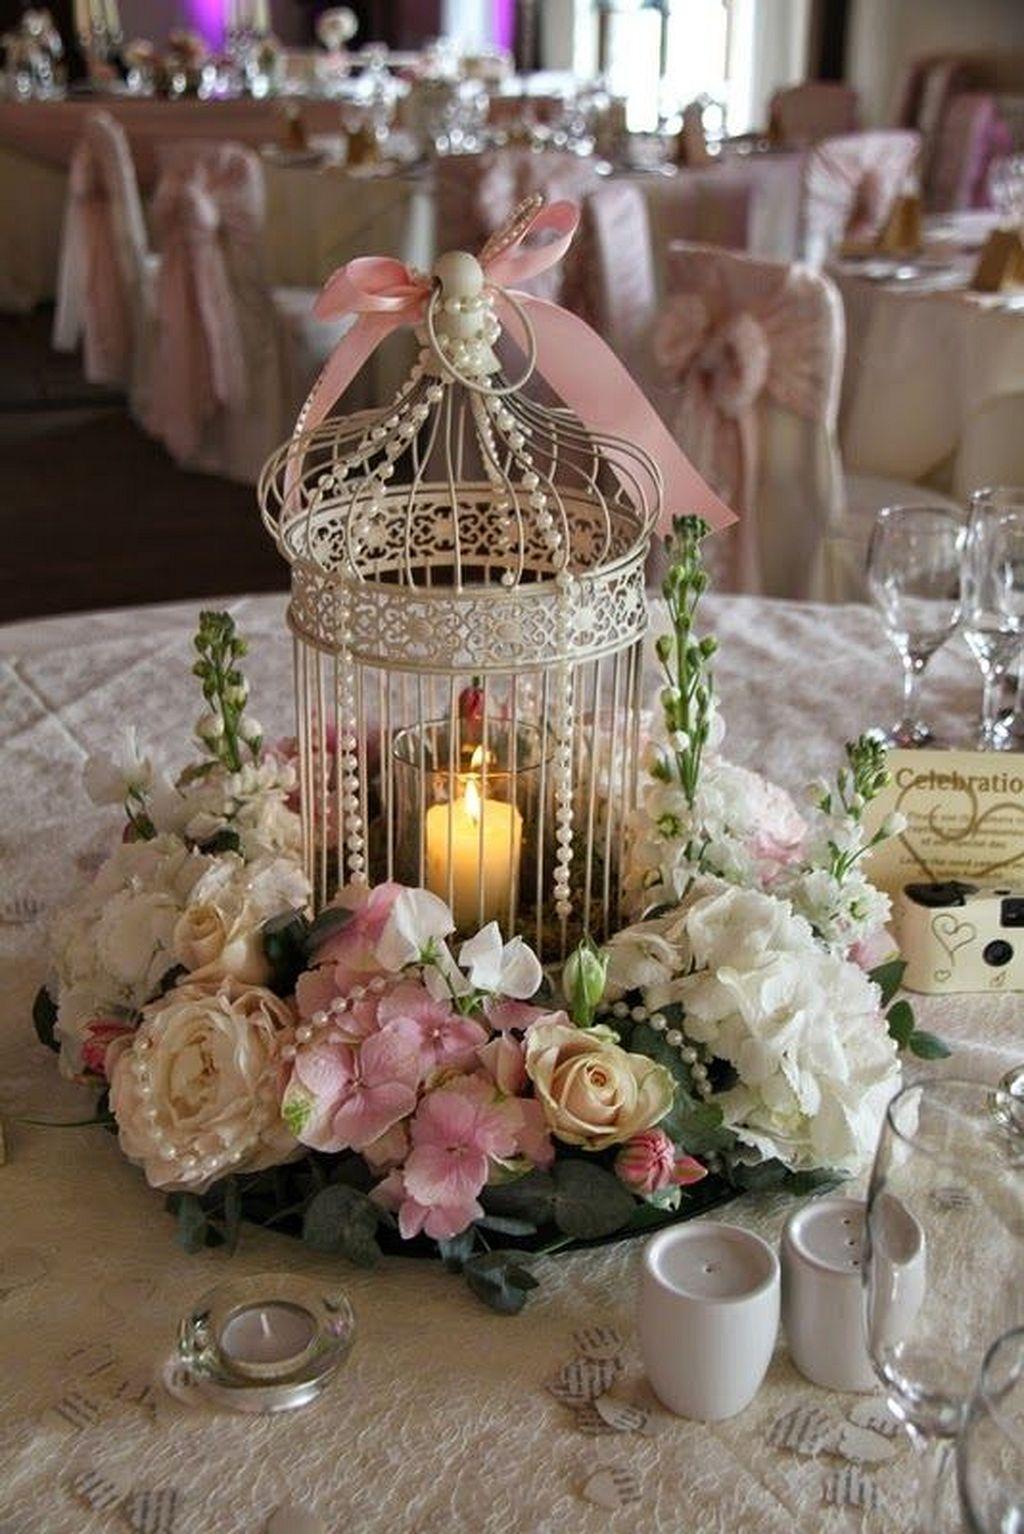 Birdcage centerpiece for rustic wedding ideas